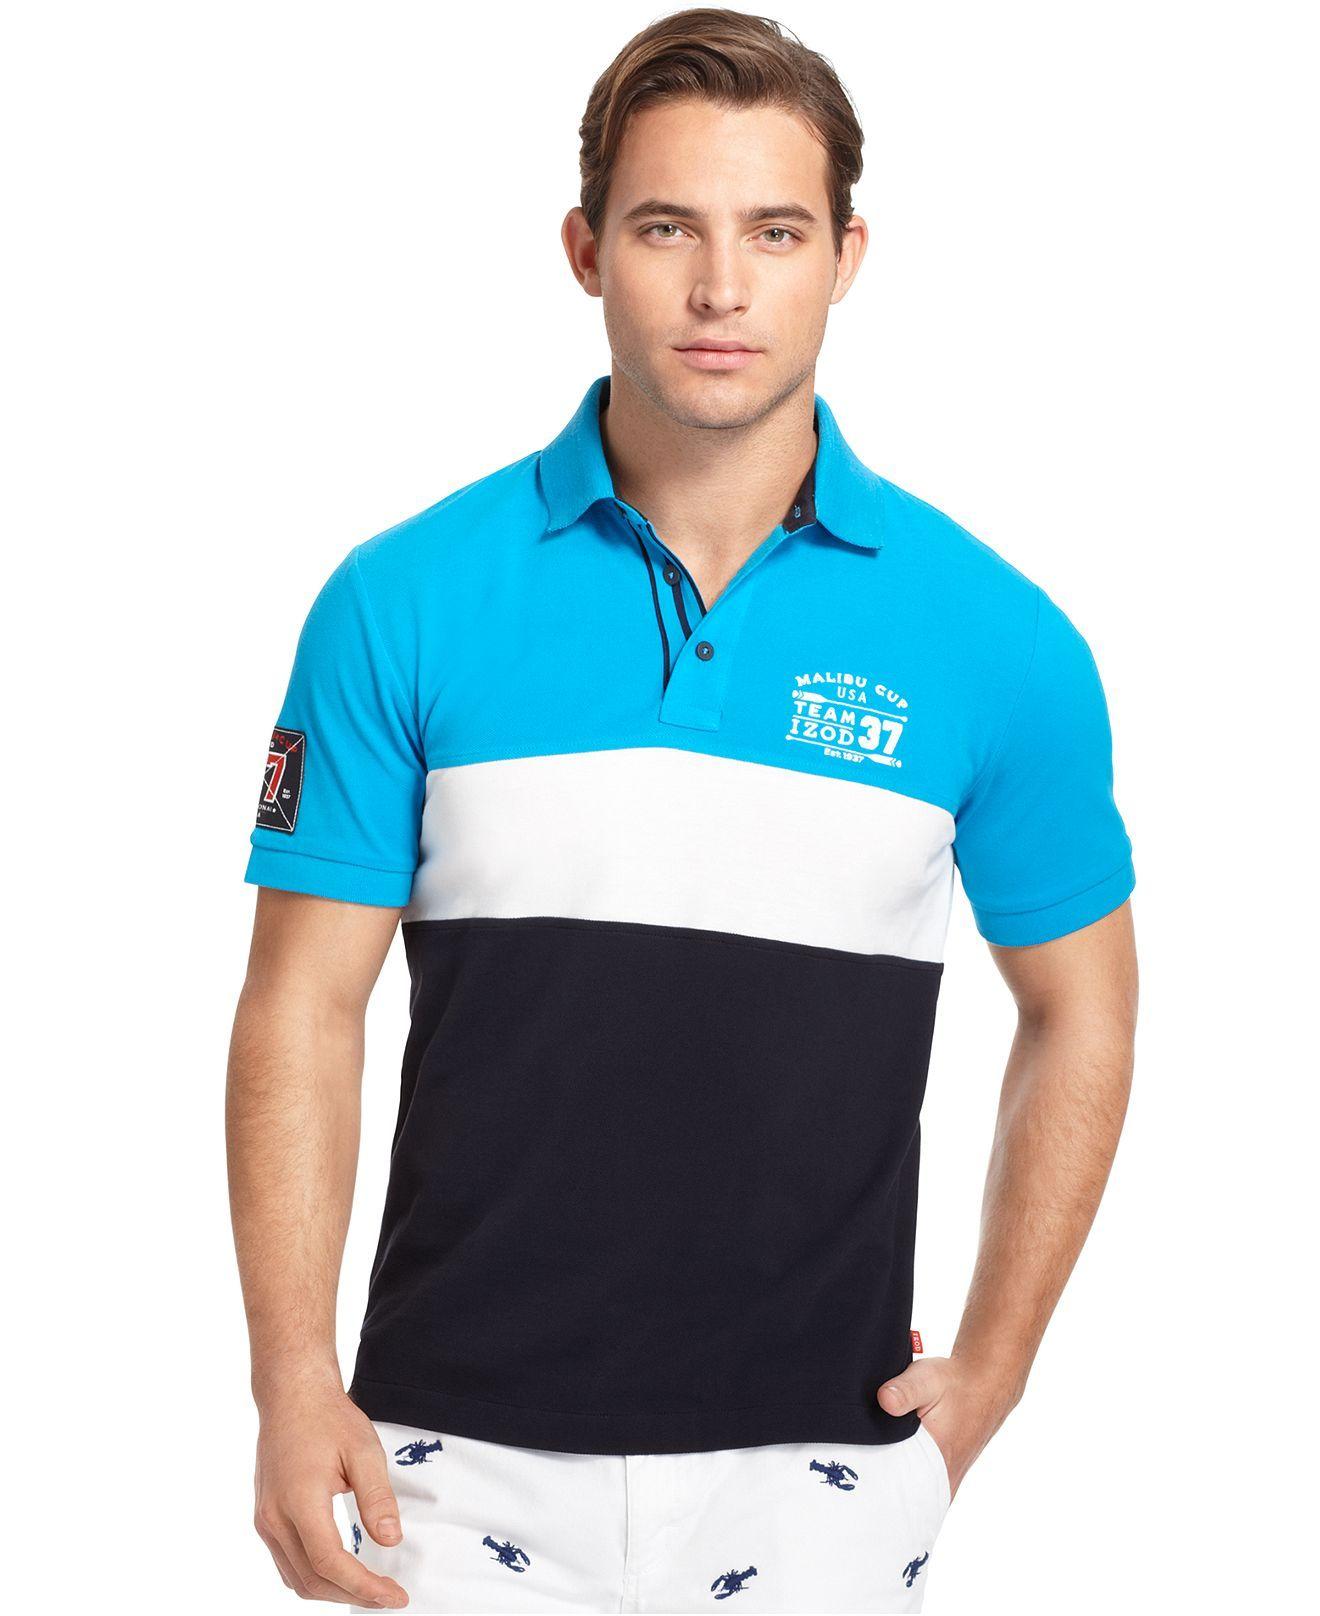 Izod malibu days shirt slim fit chest stripe polo shirt